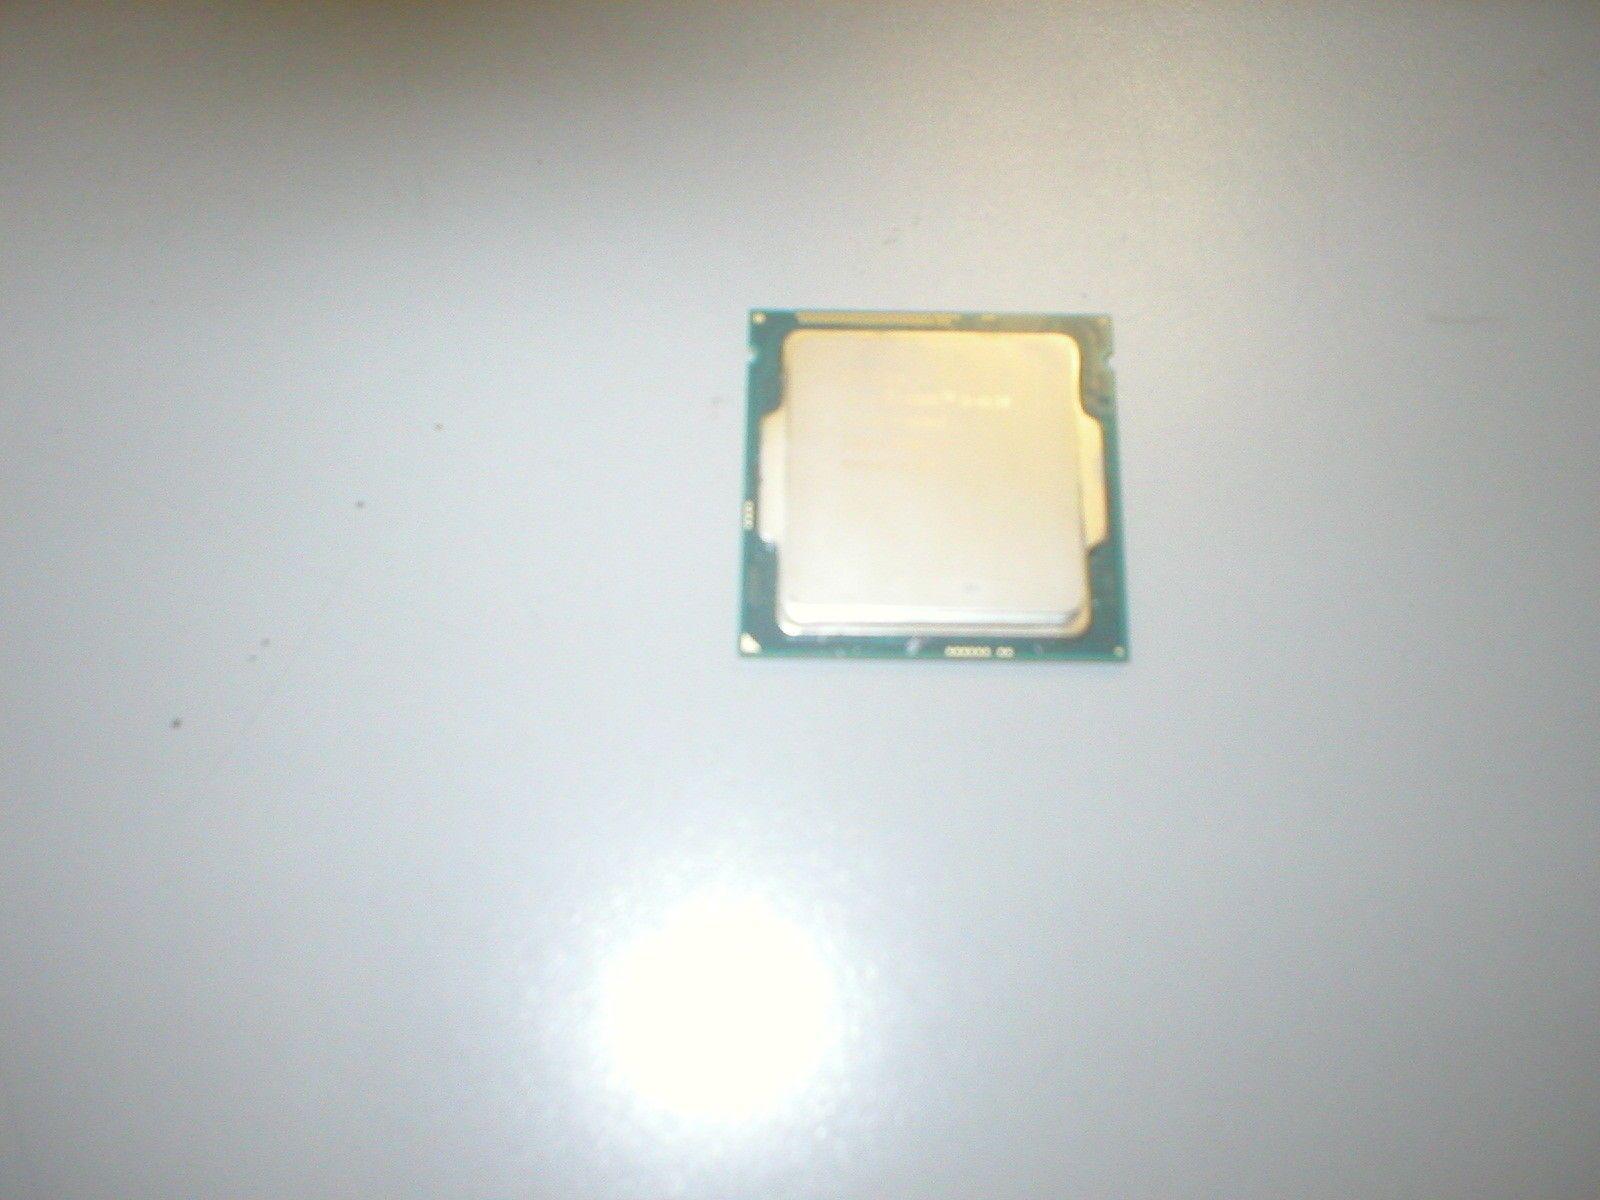 Intel Core I3 4130 340ghz Cpu Processor Used